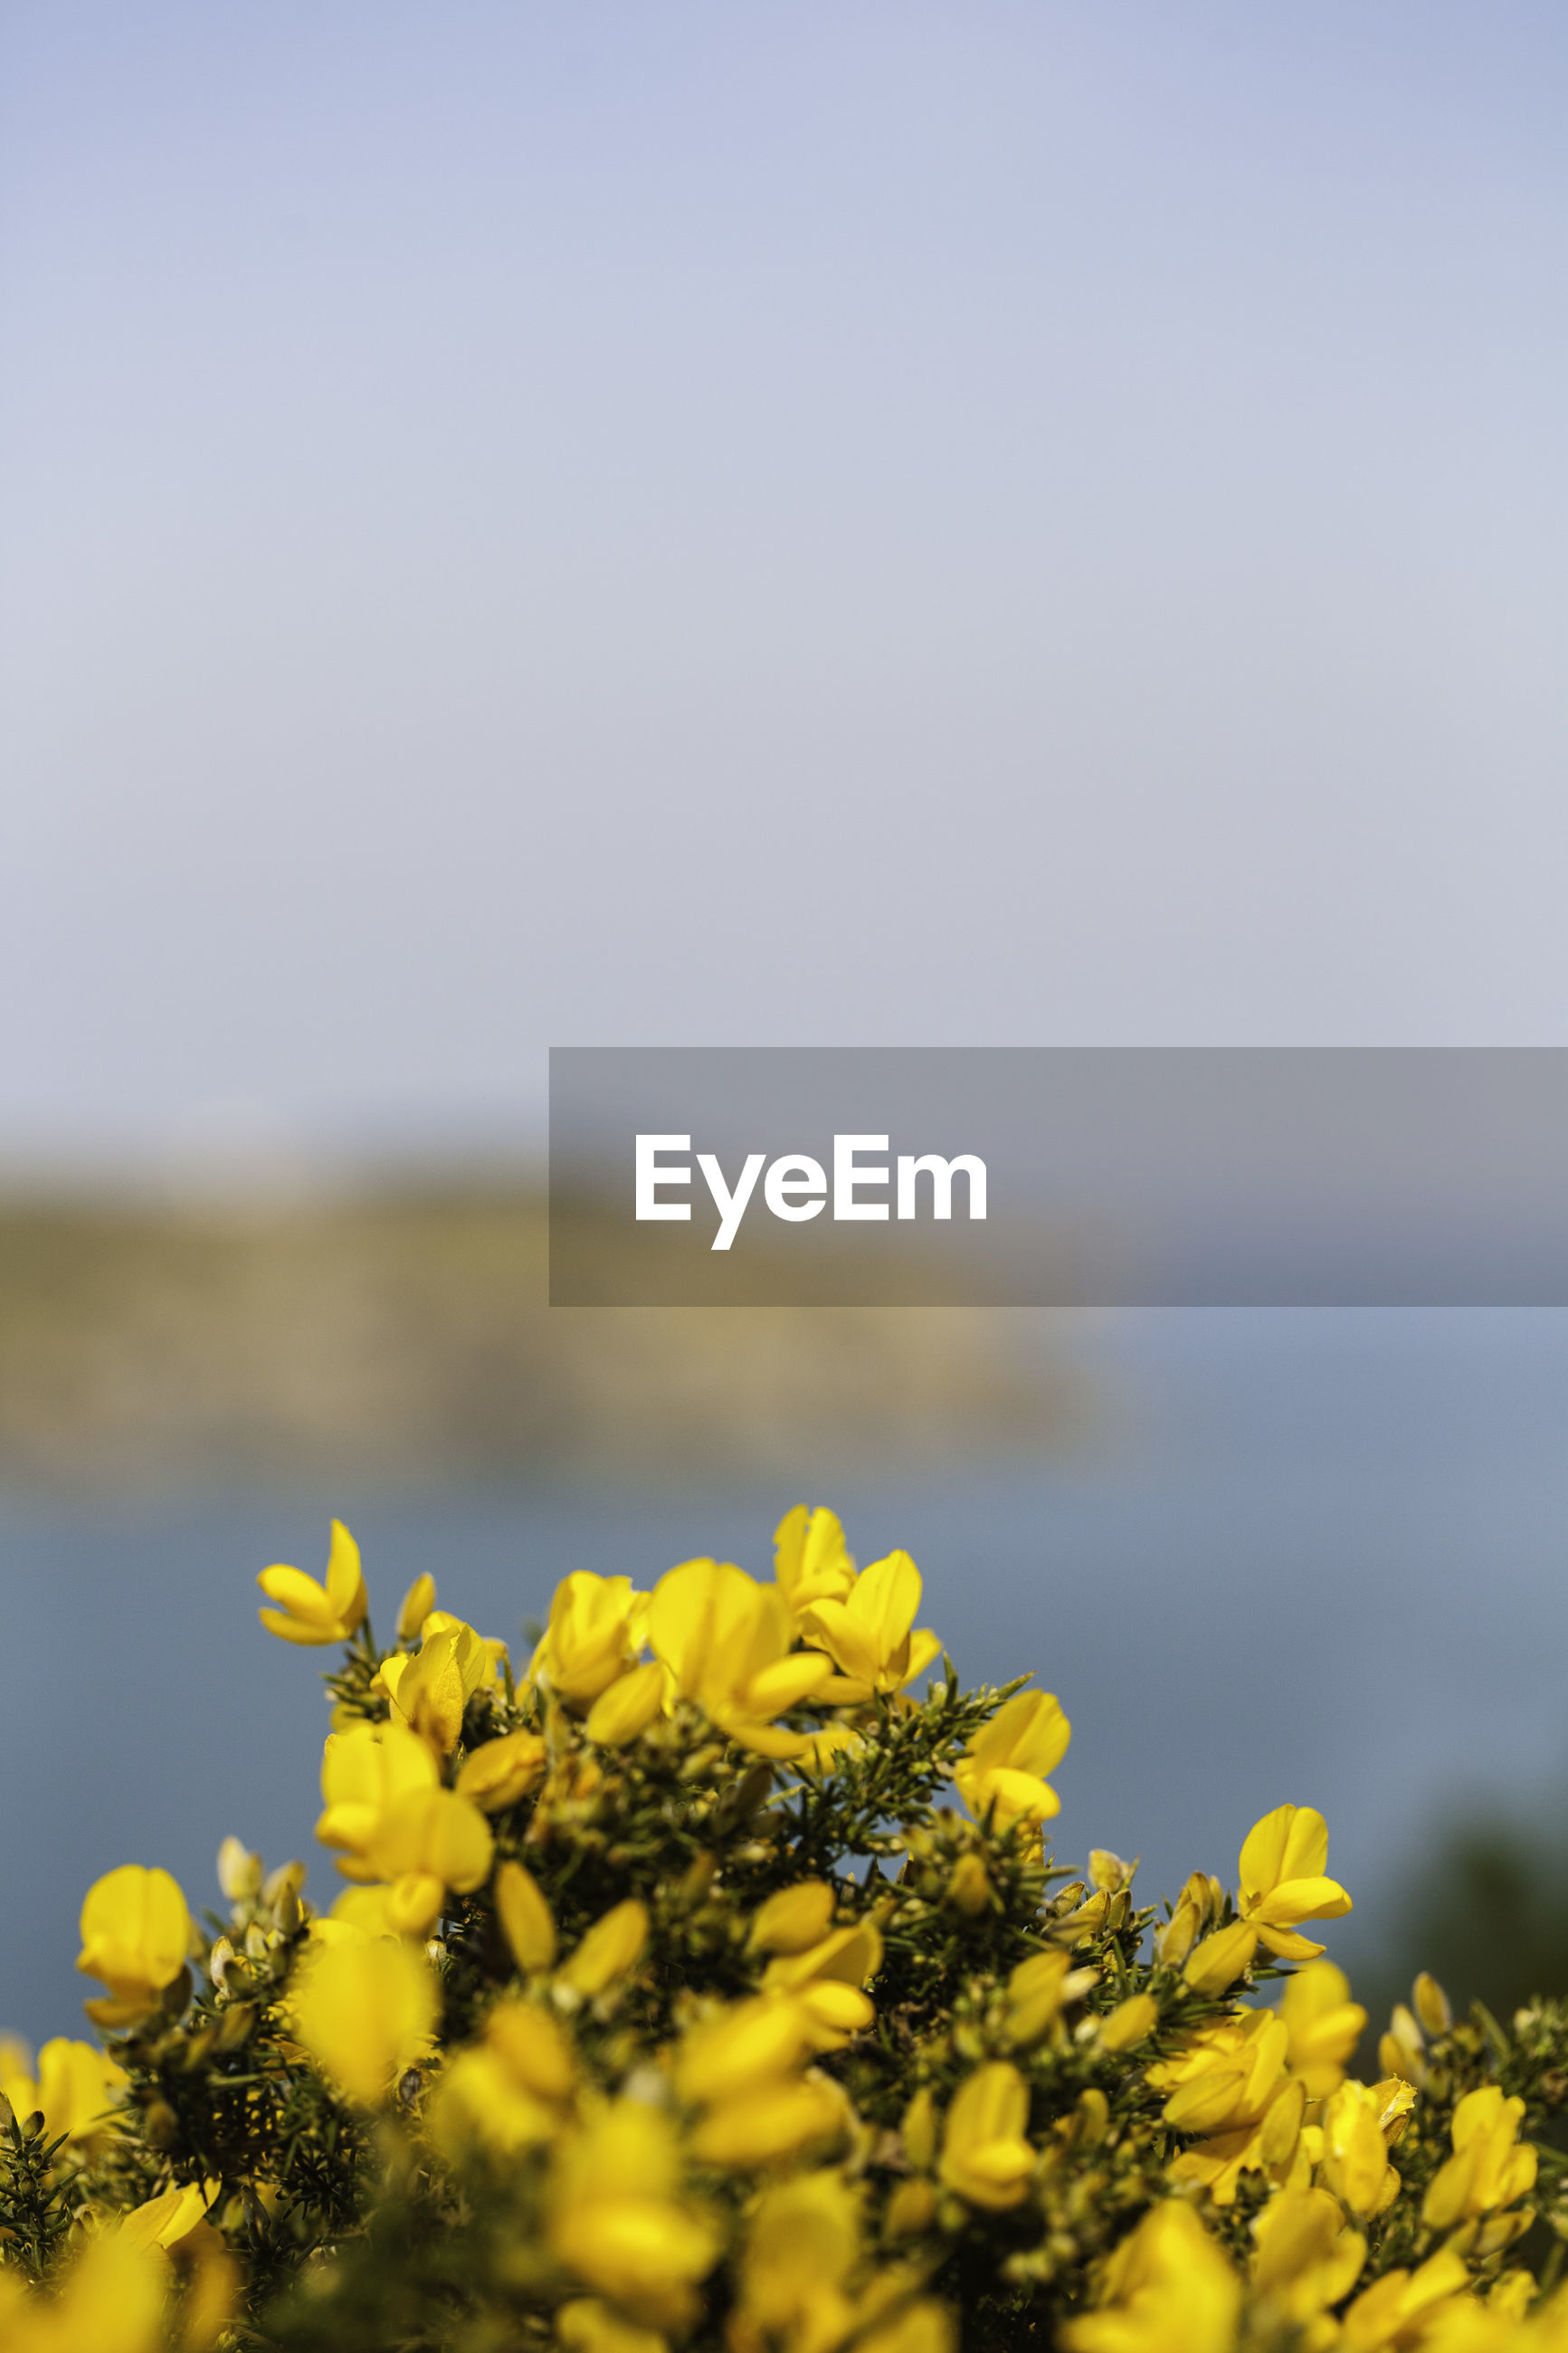 YELLOW FLOWERING PLANT AGAINST SEA